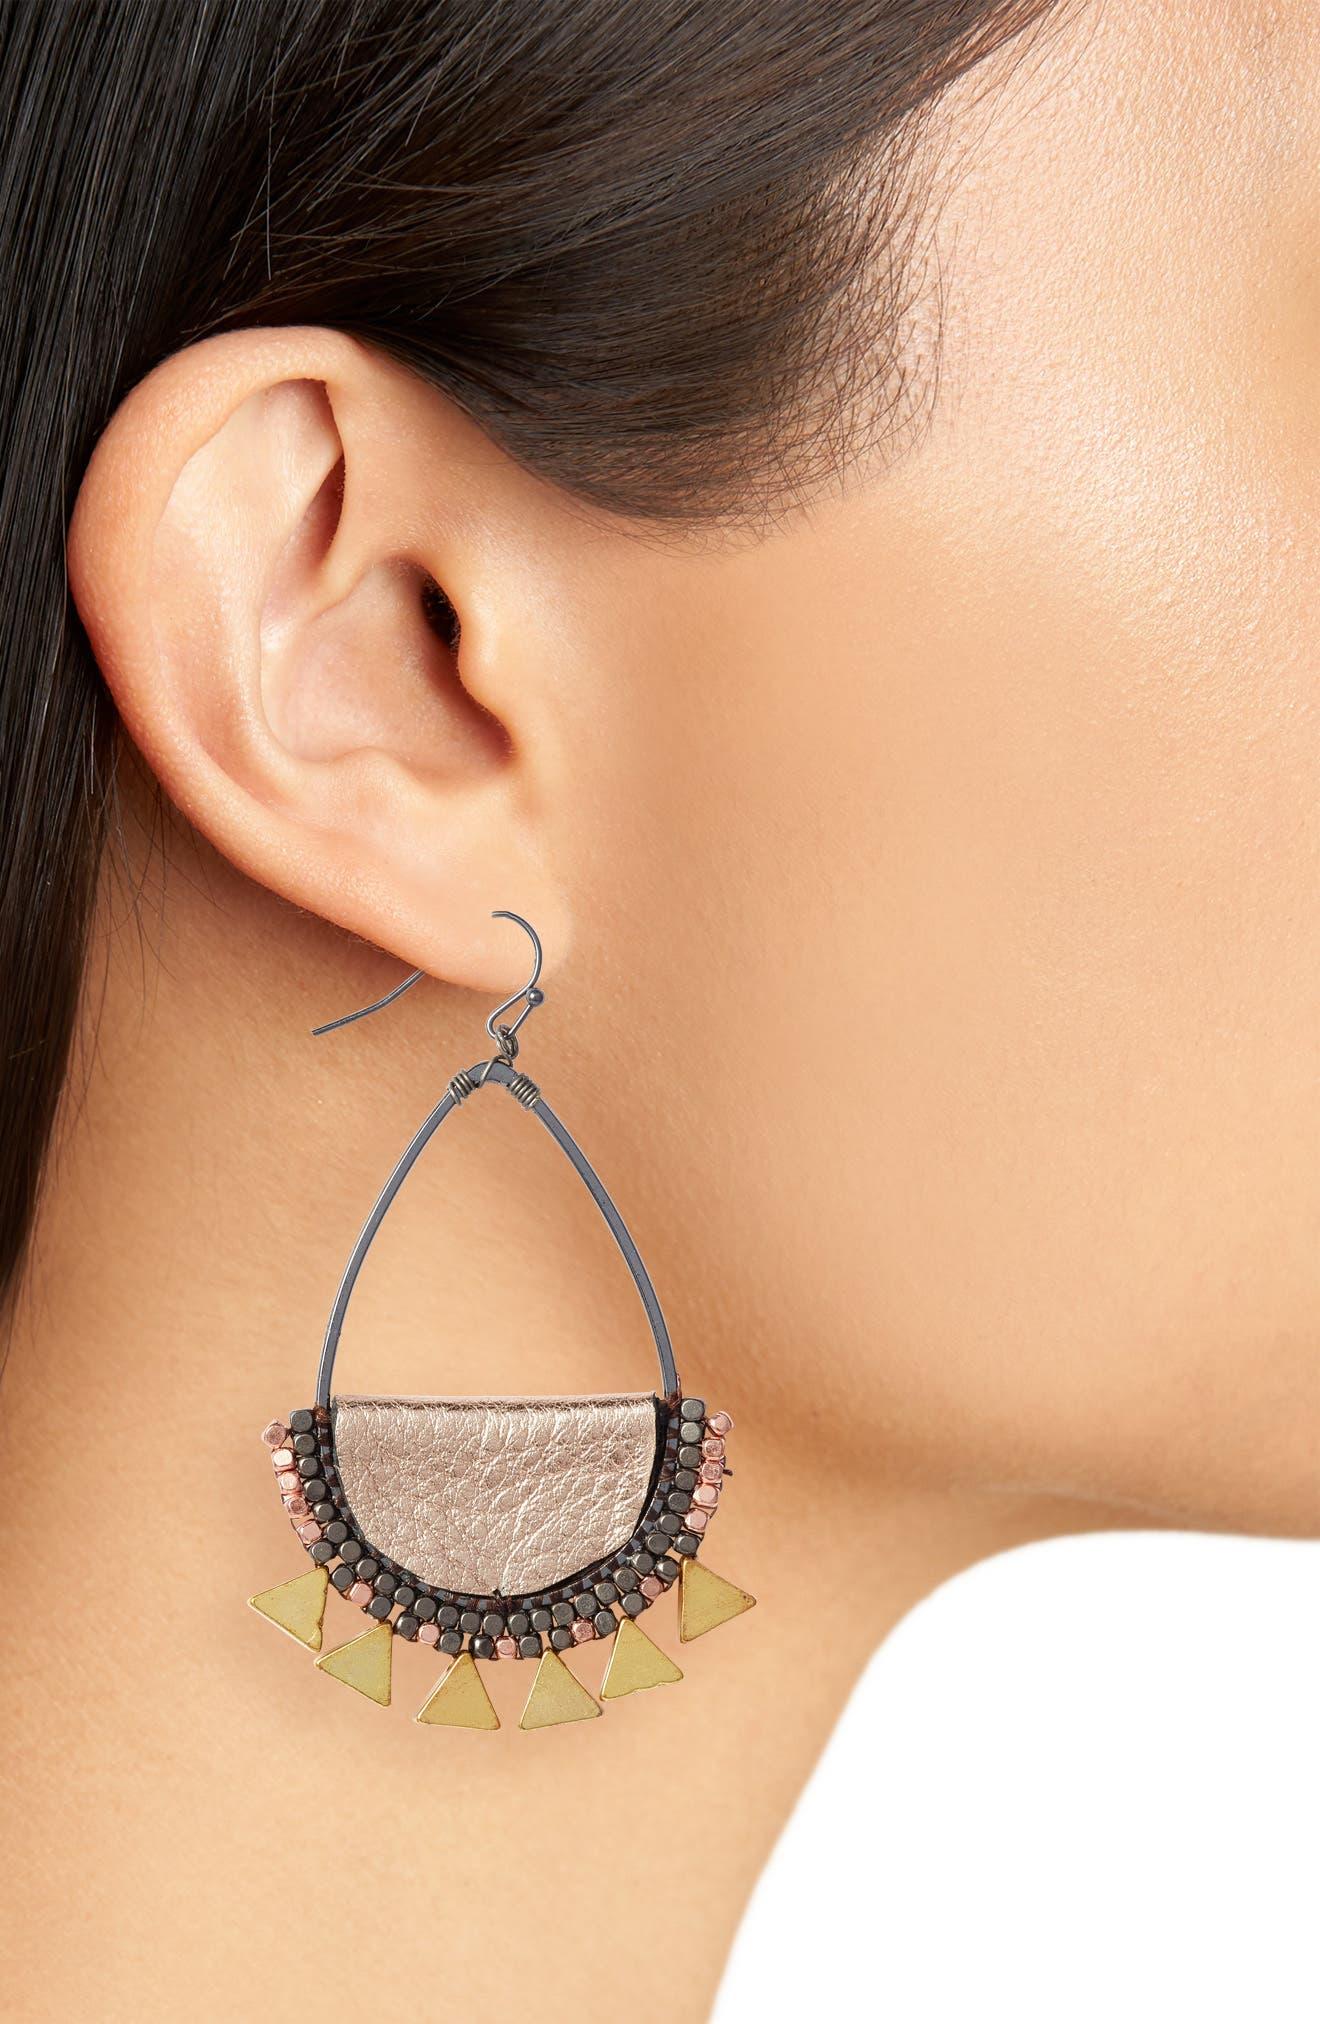 Beaded Teardrop Earrings,                             Alternate thumbnail 2, color,                             710